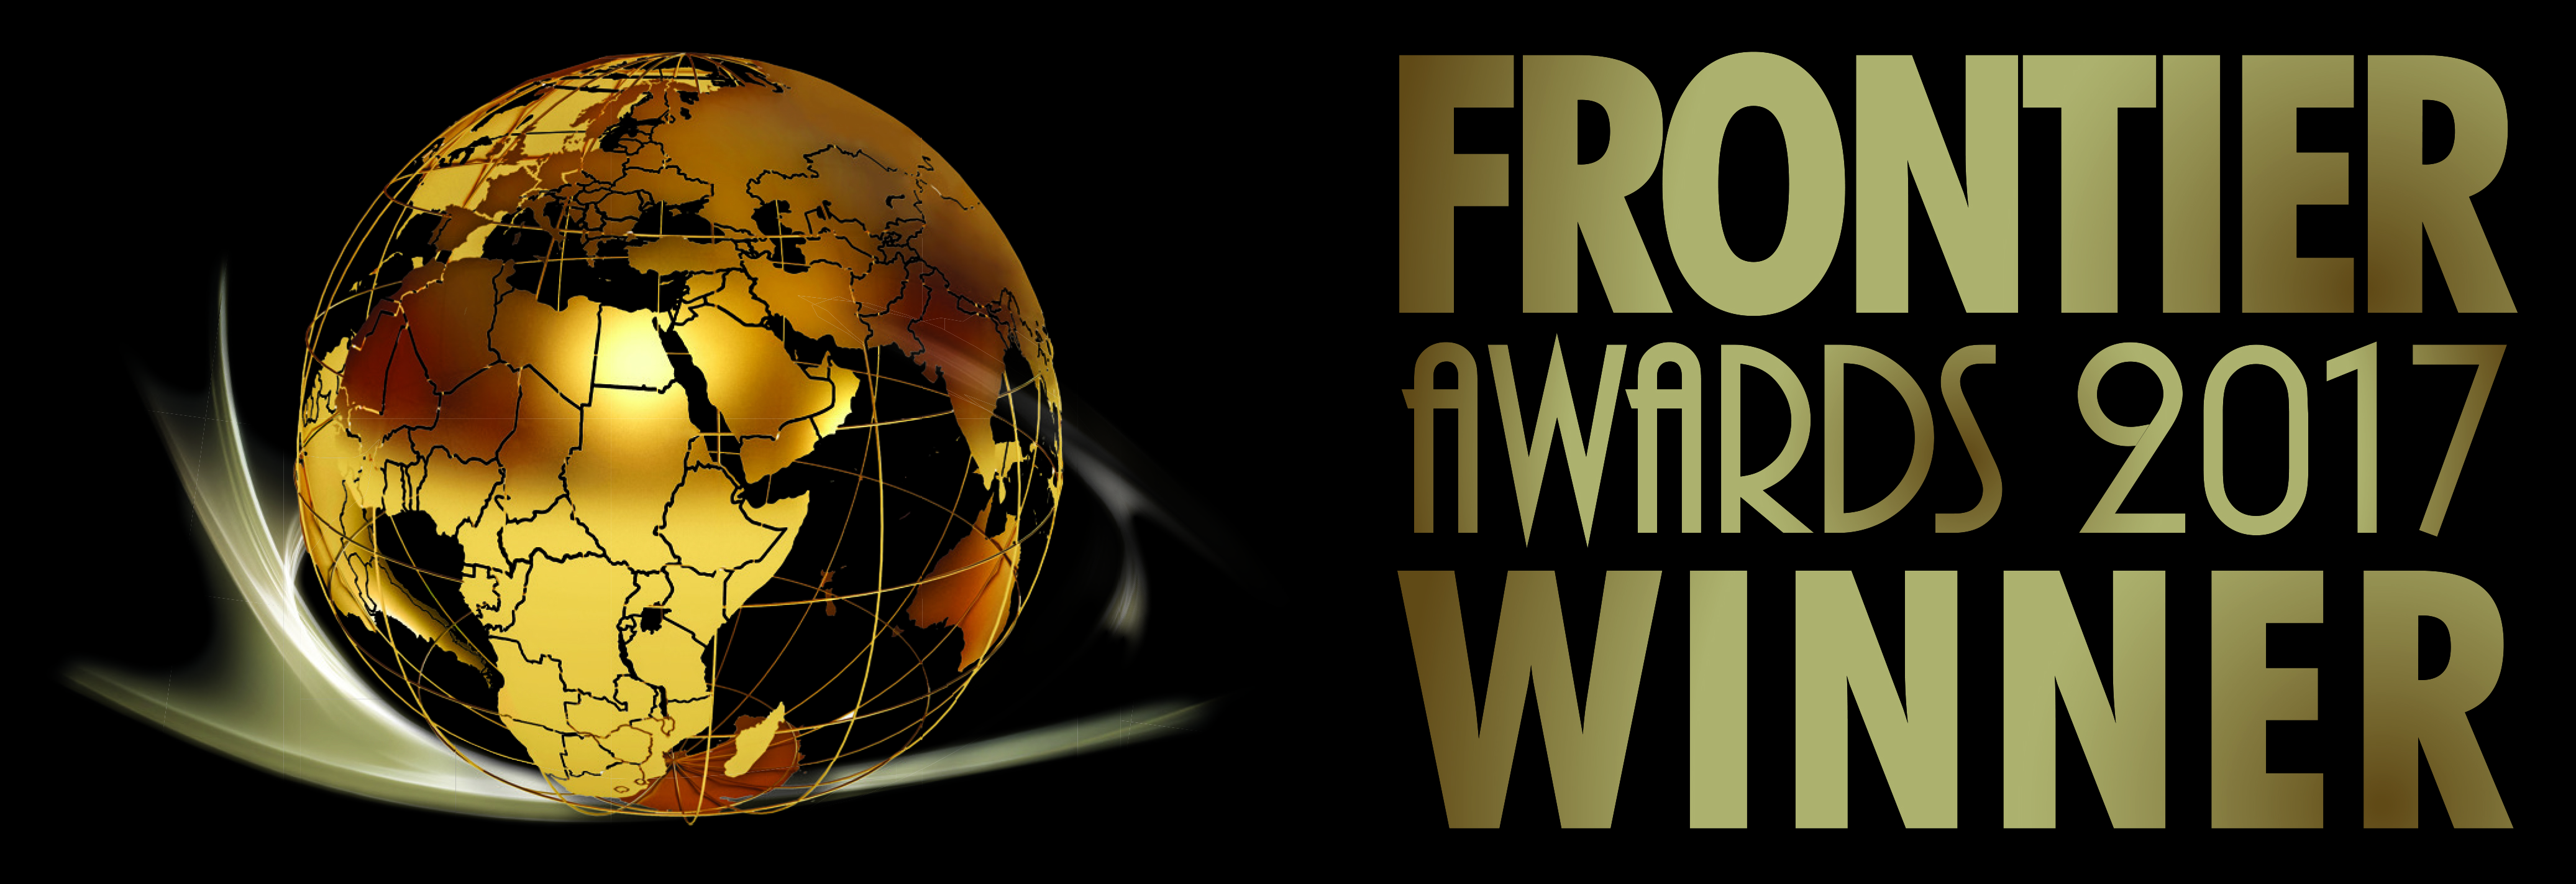 Frontier awards 2017 shortlist frontier magazine malvernweather Choice Image